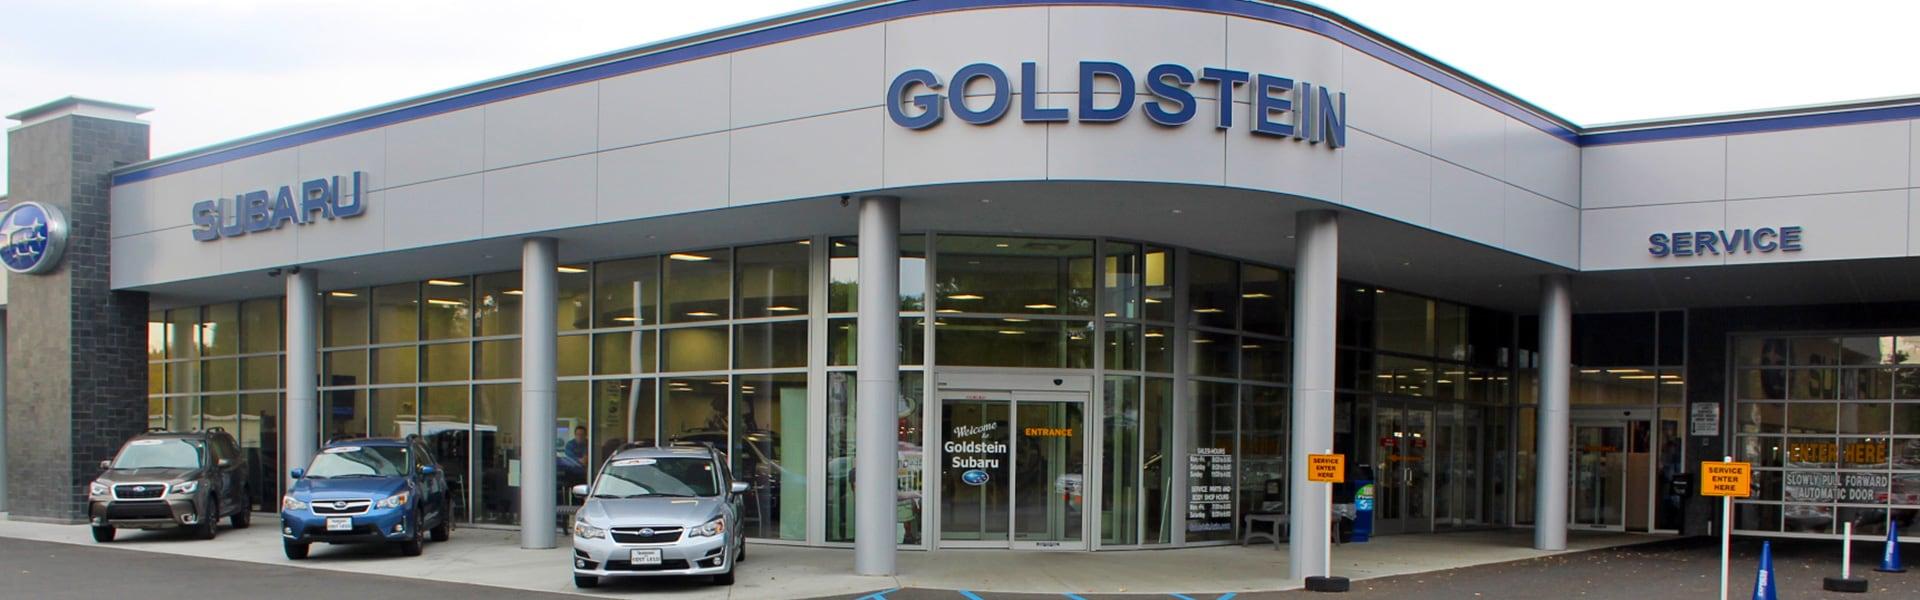 Albany Subaru Dealer in Albany NY | Colonie Schenectady Troy Subaru